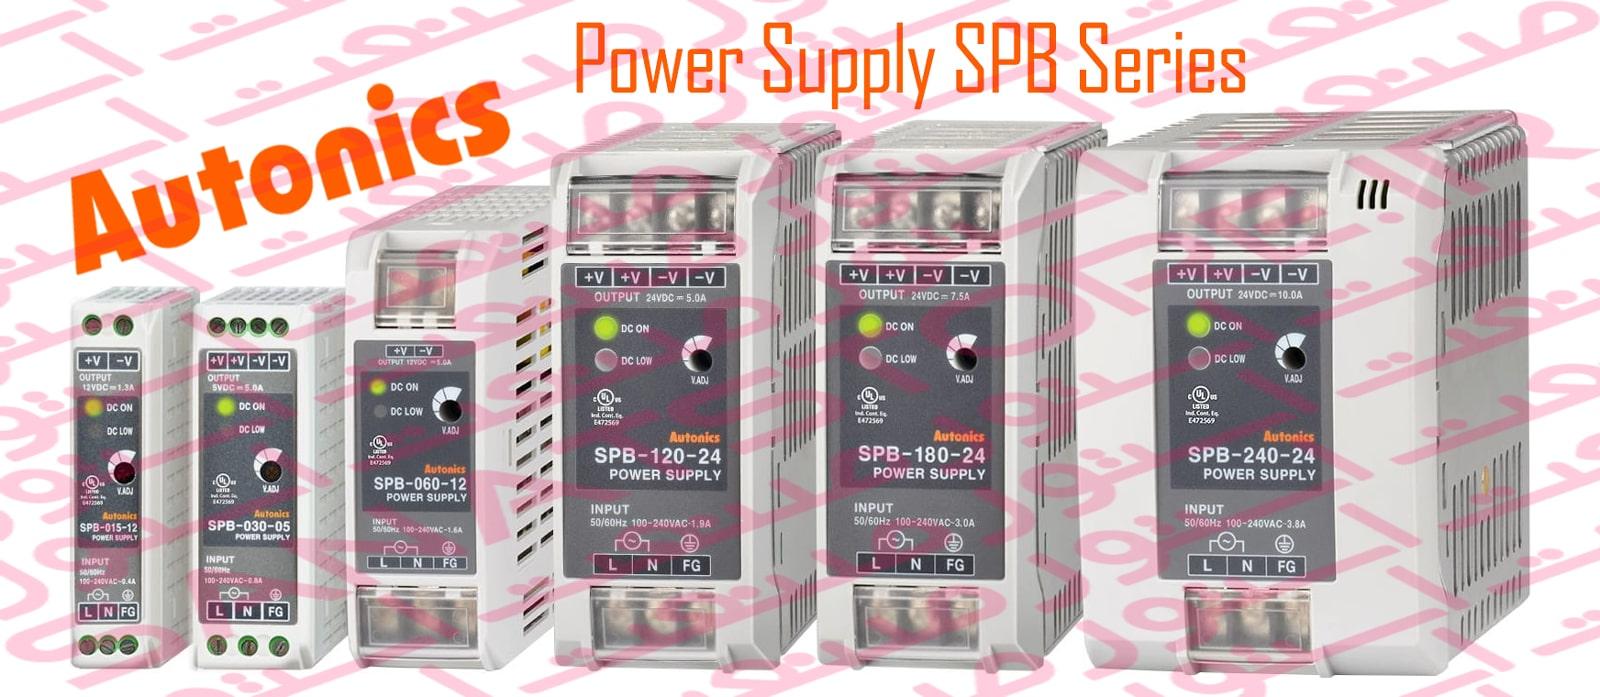 Autonics Power Supply SPB Series